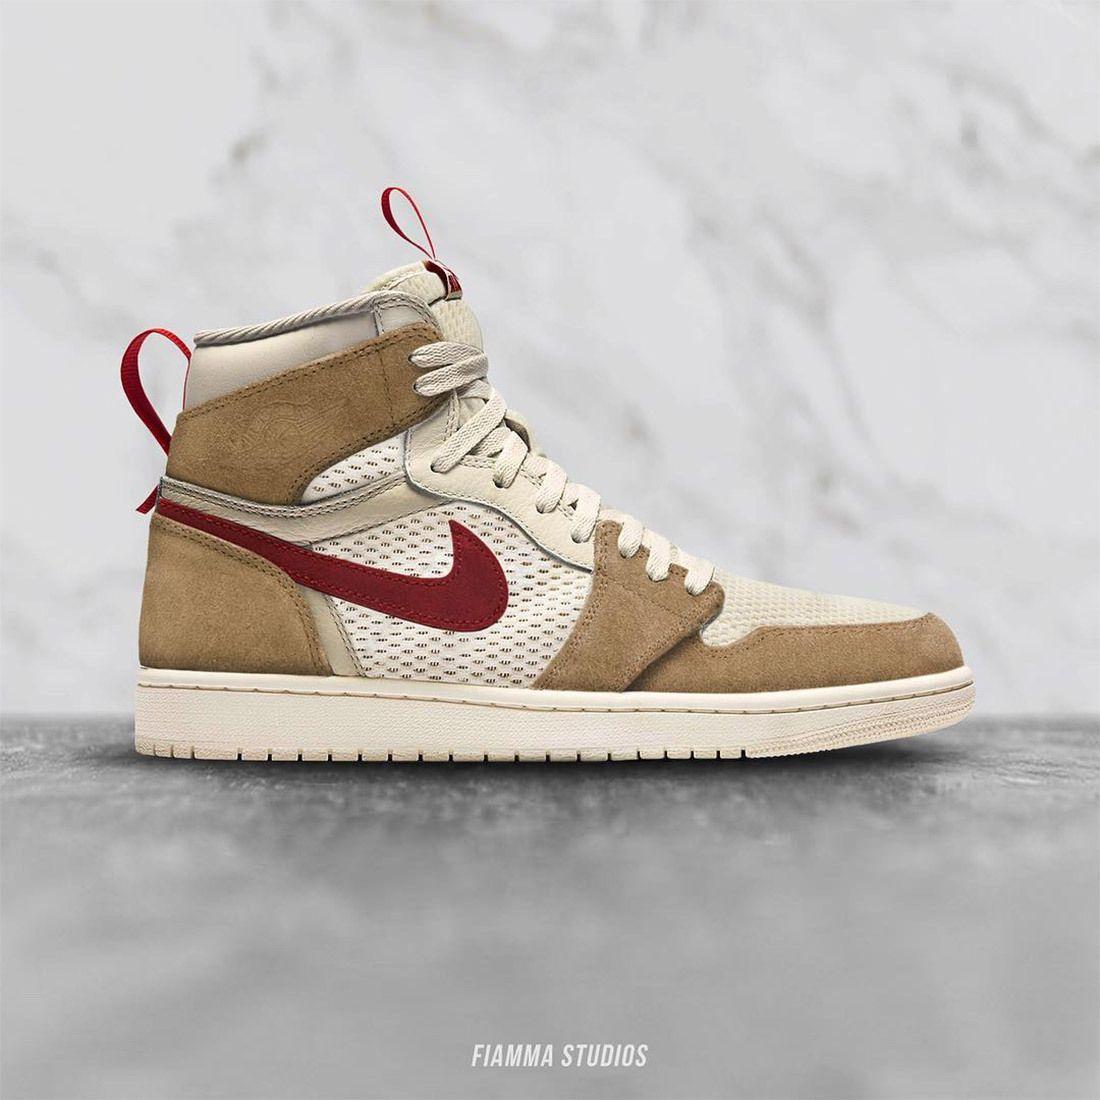 Chase Shiel X Fiammastudios Tom Sachs Nike Mars Yard Shoe Air Jordan 1 Sneaker Freaker 4